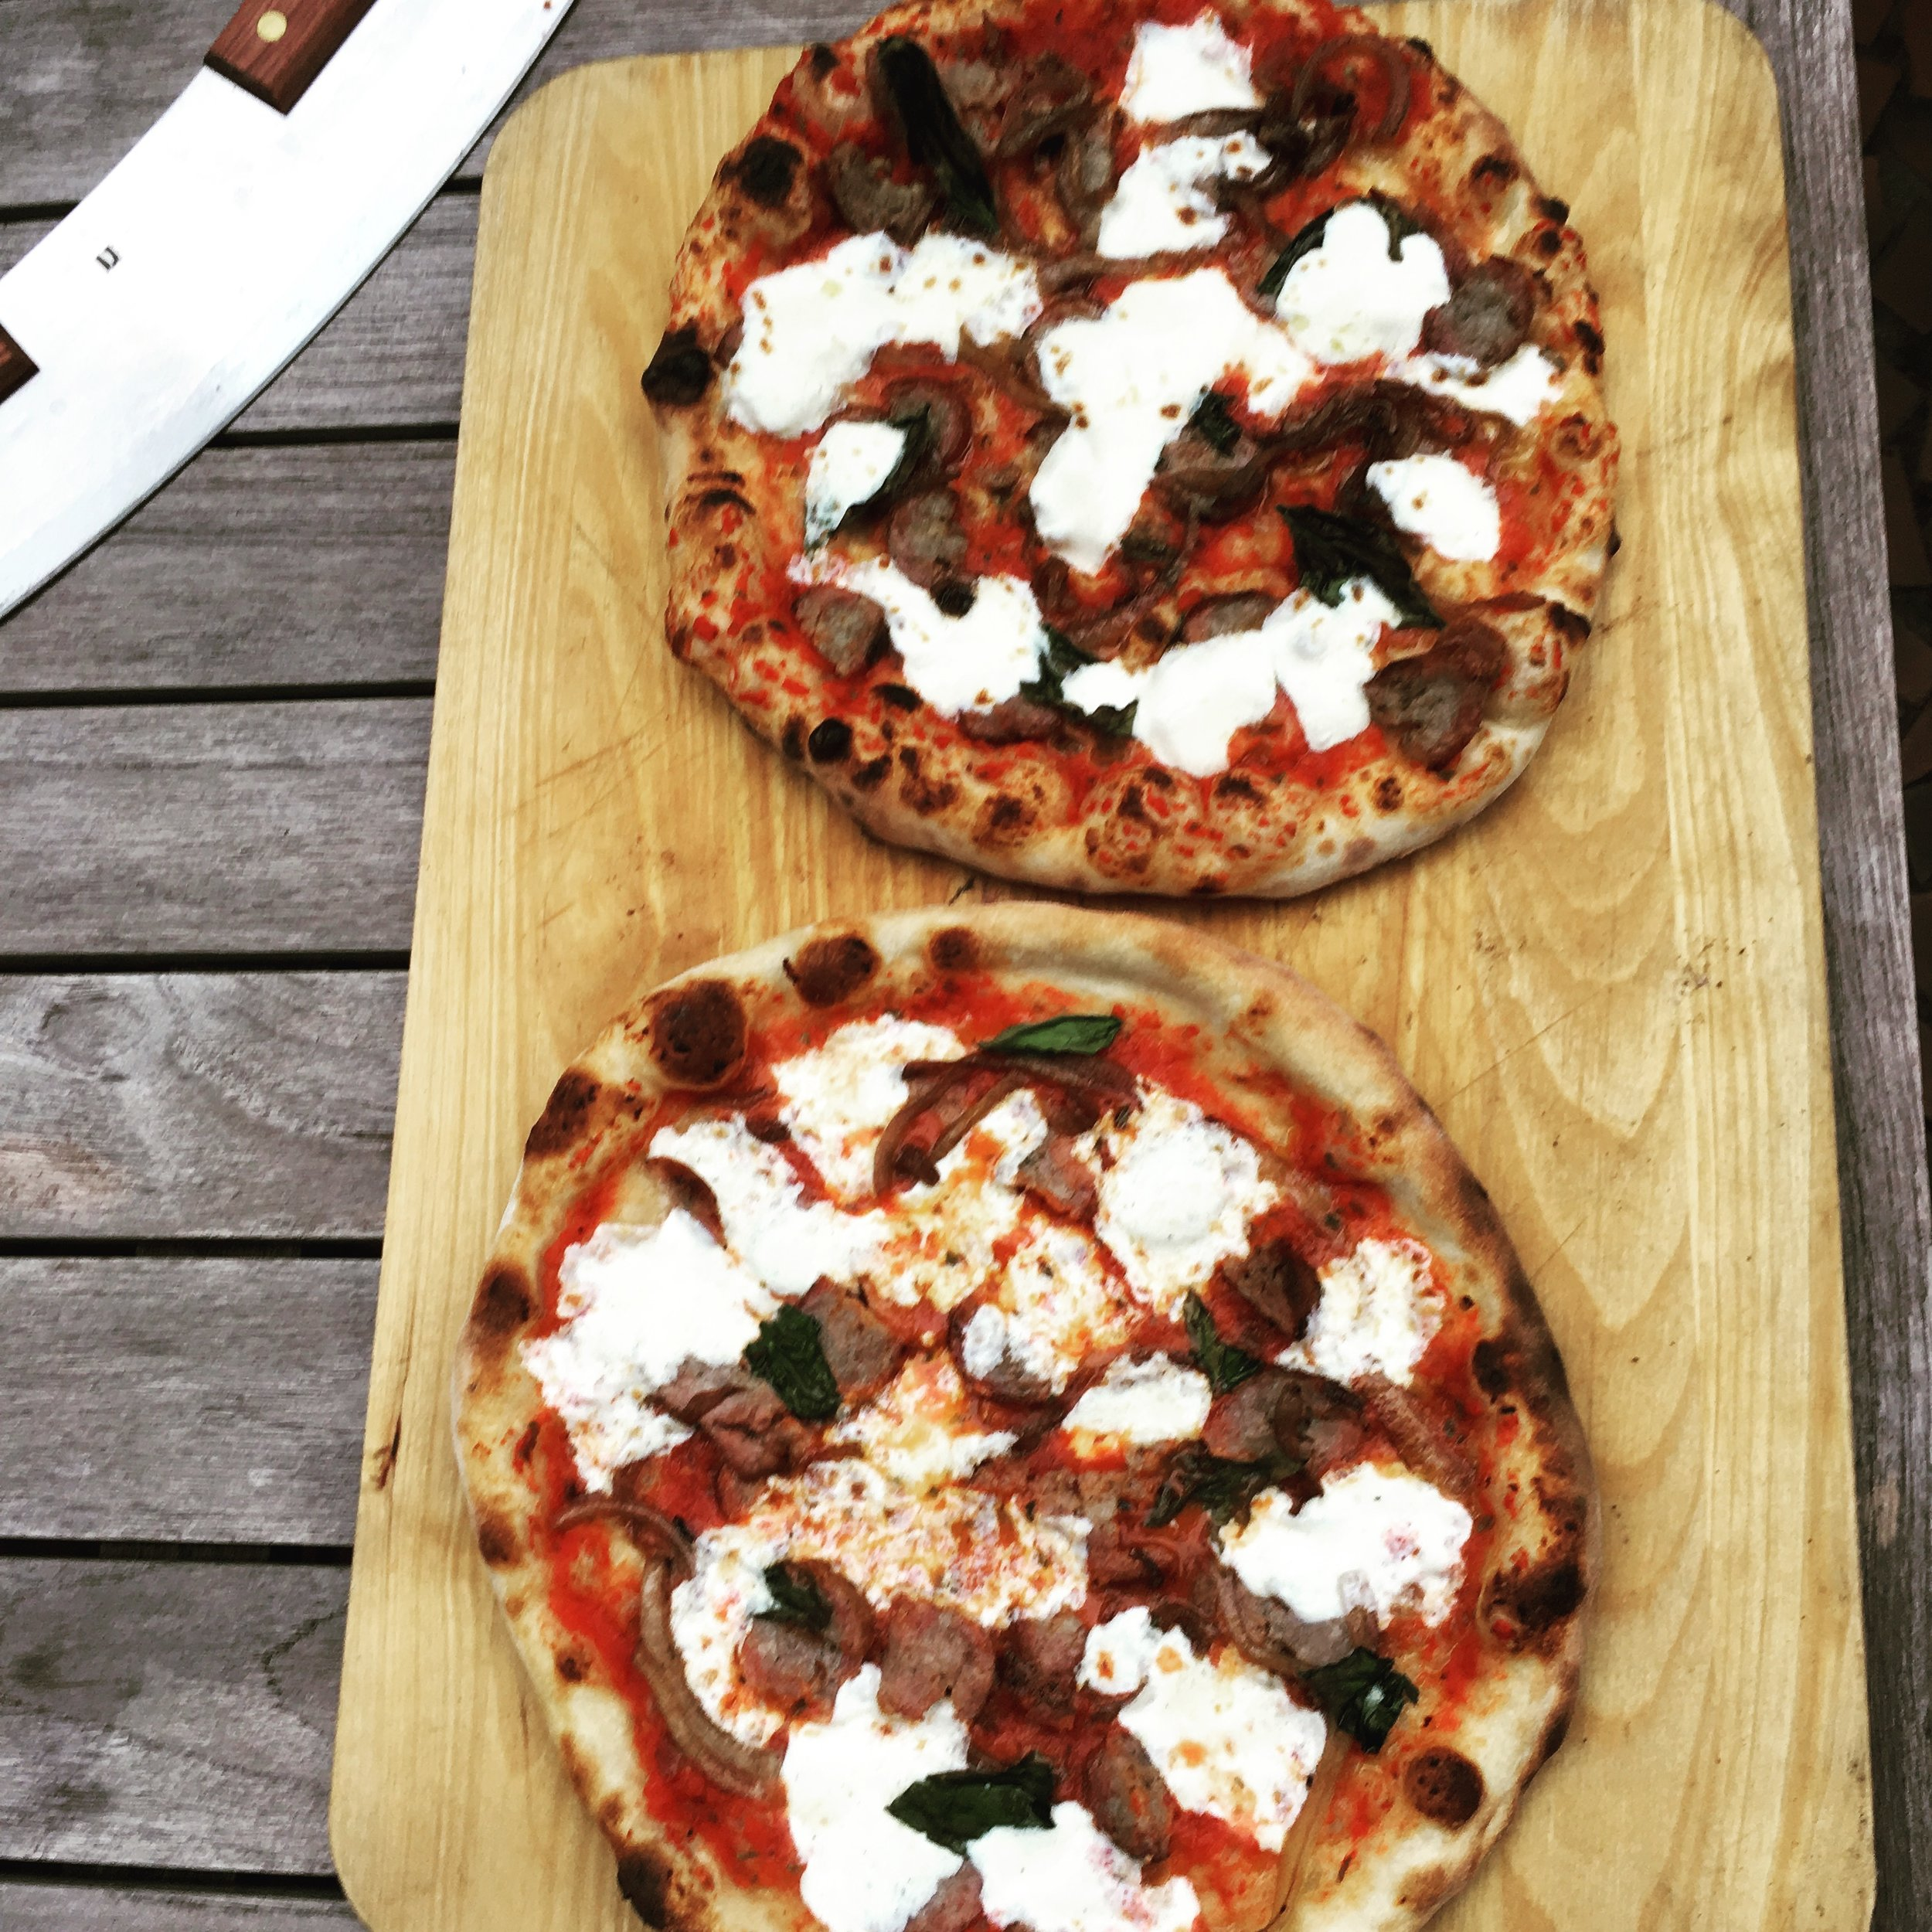 Pizza-Porta bottom pizza vs Wood Fired Oven top pizza